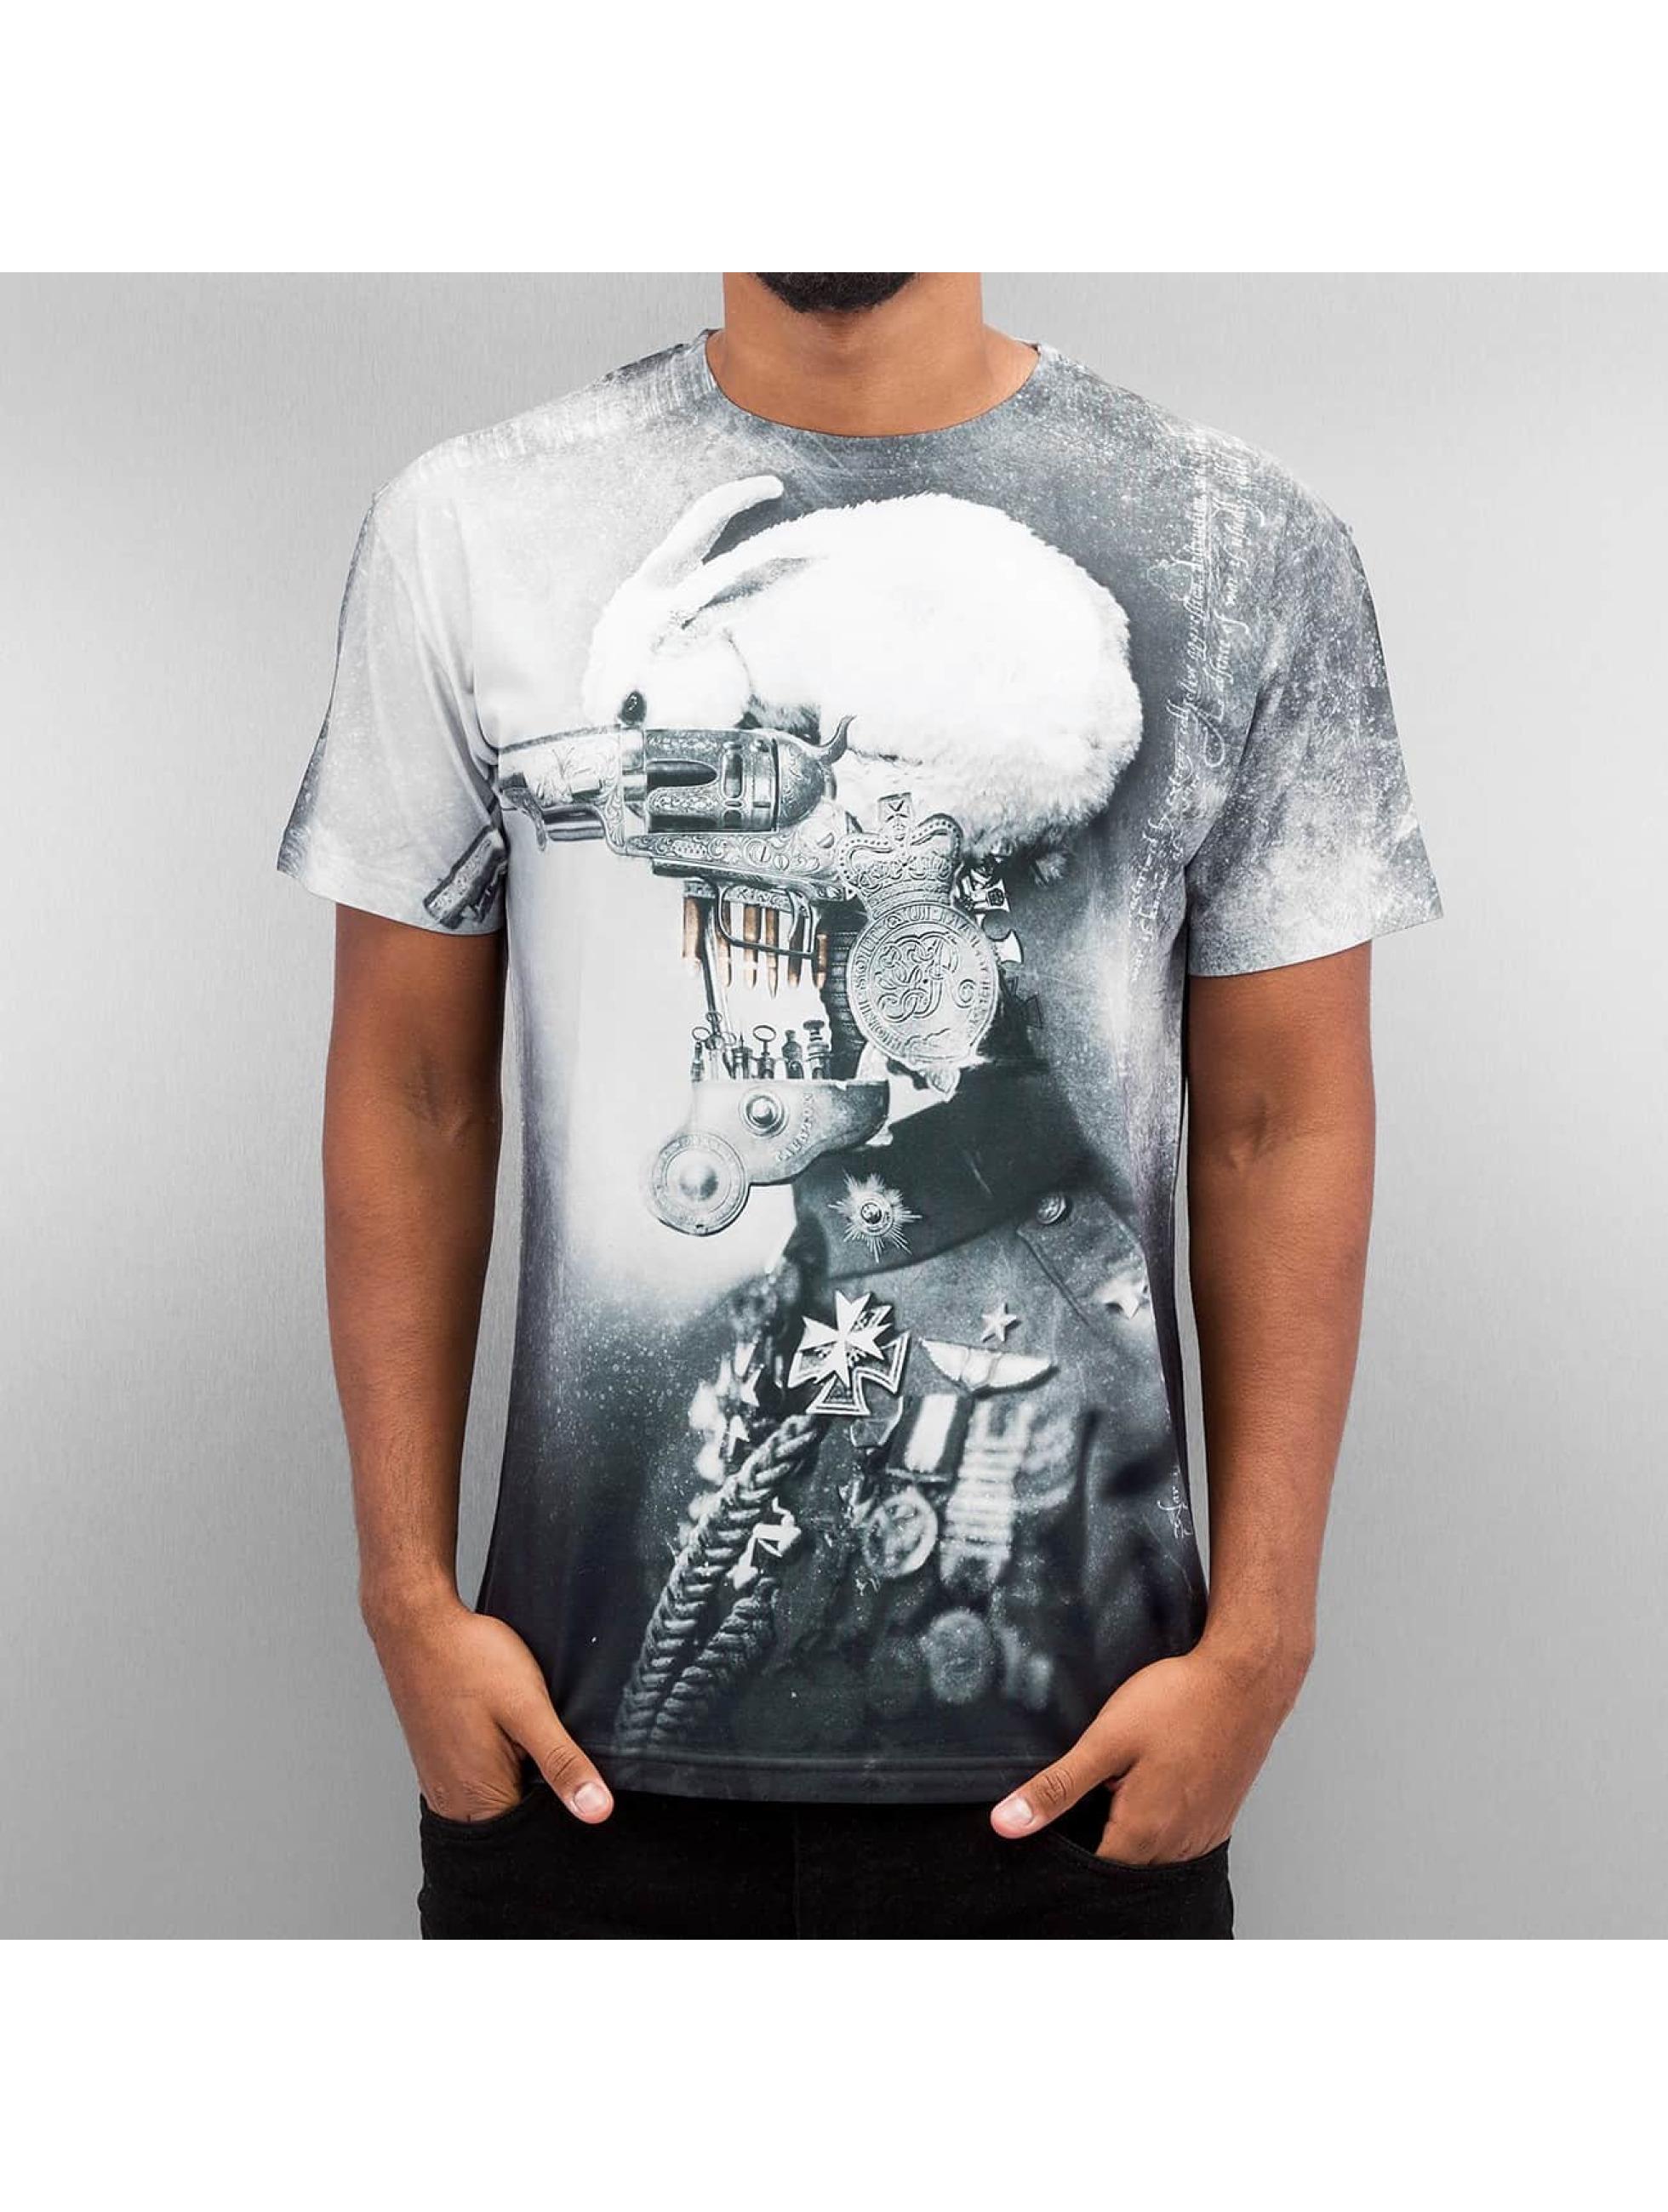 Monkey Business T-Shirt War Rabbit colored